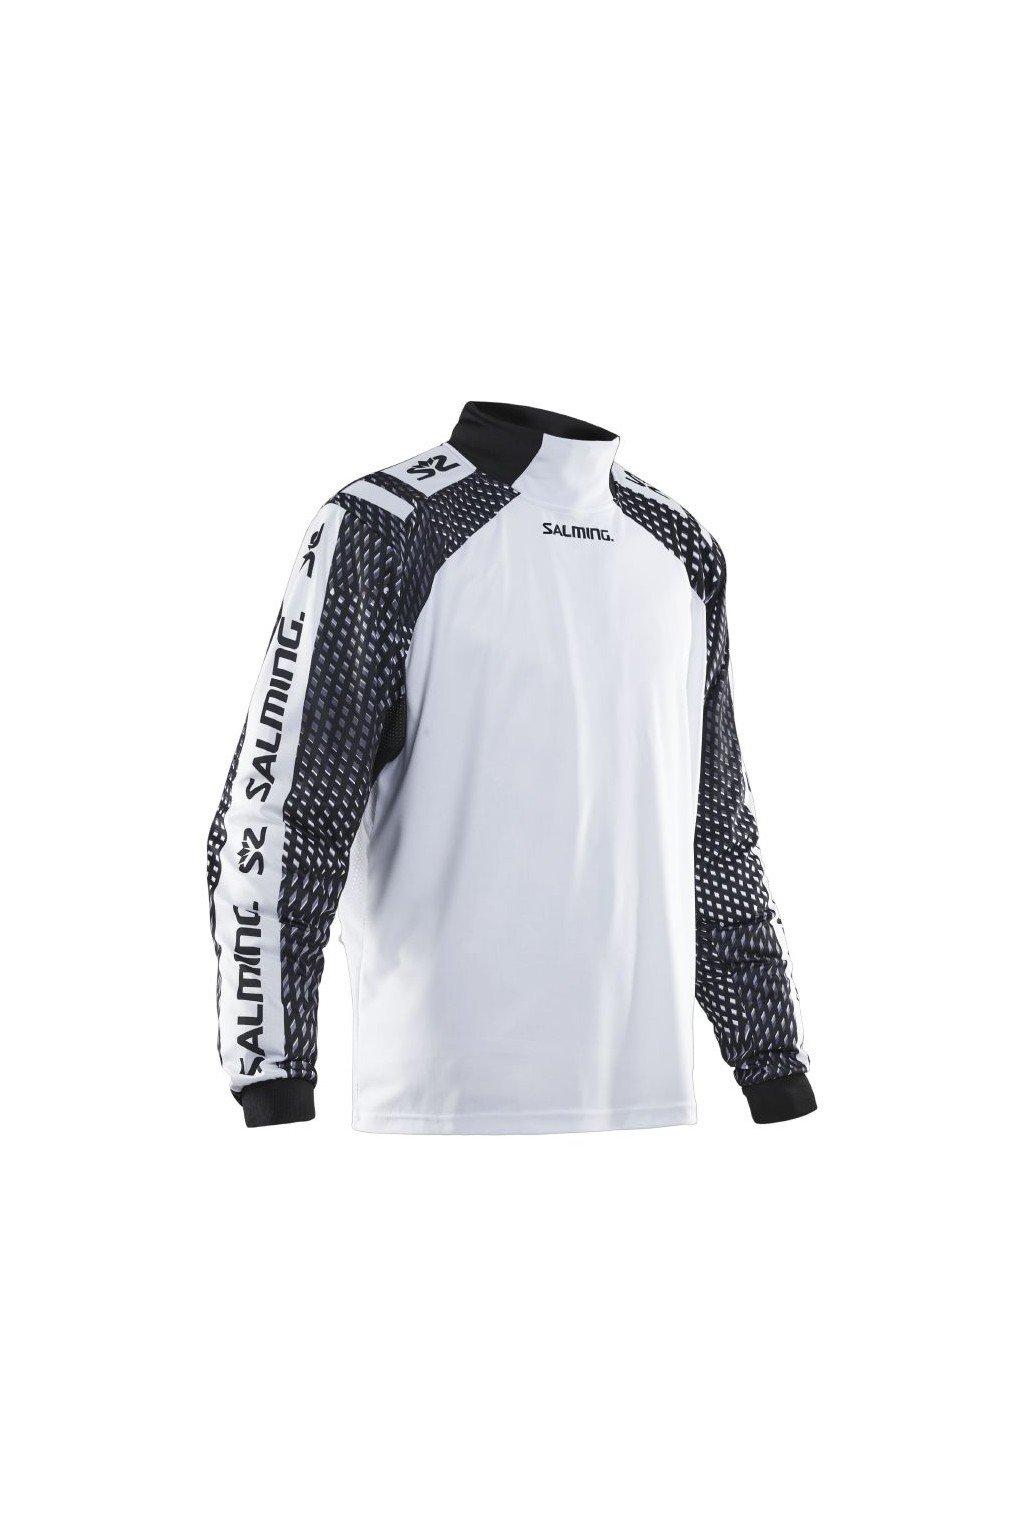 salming atilla jersey sr white black l